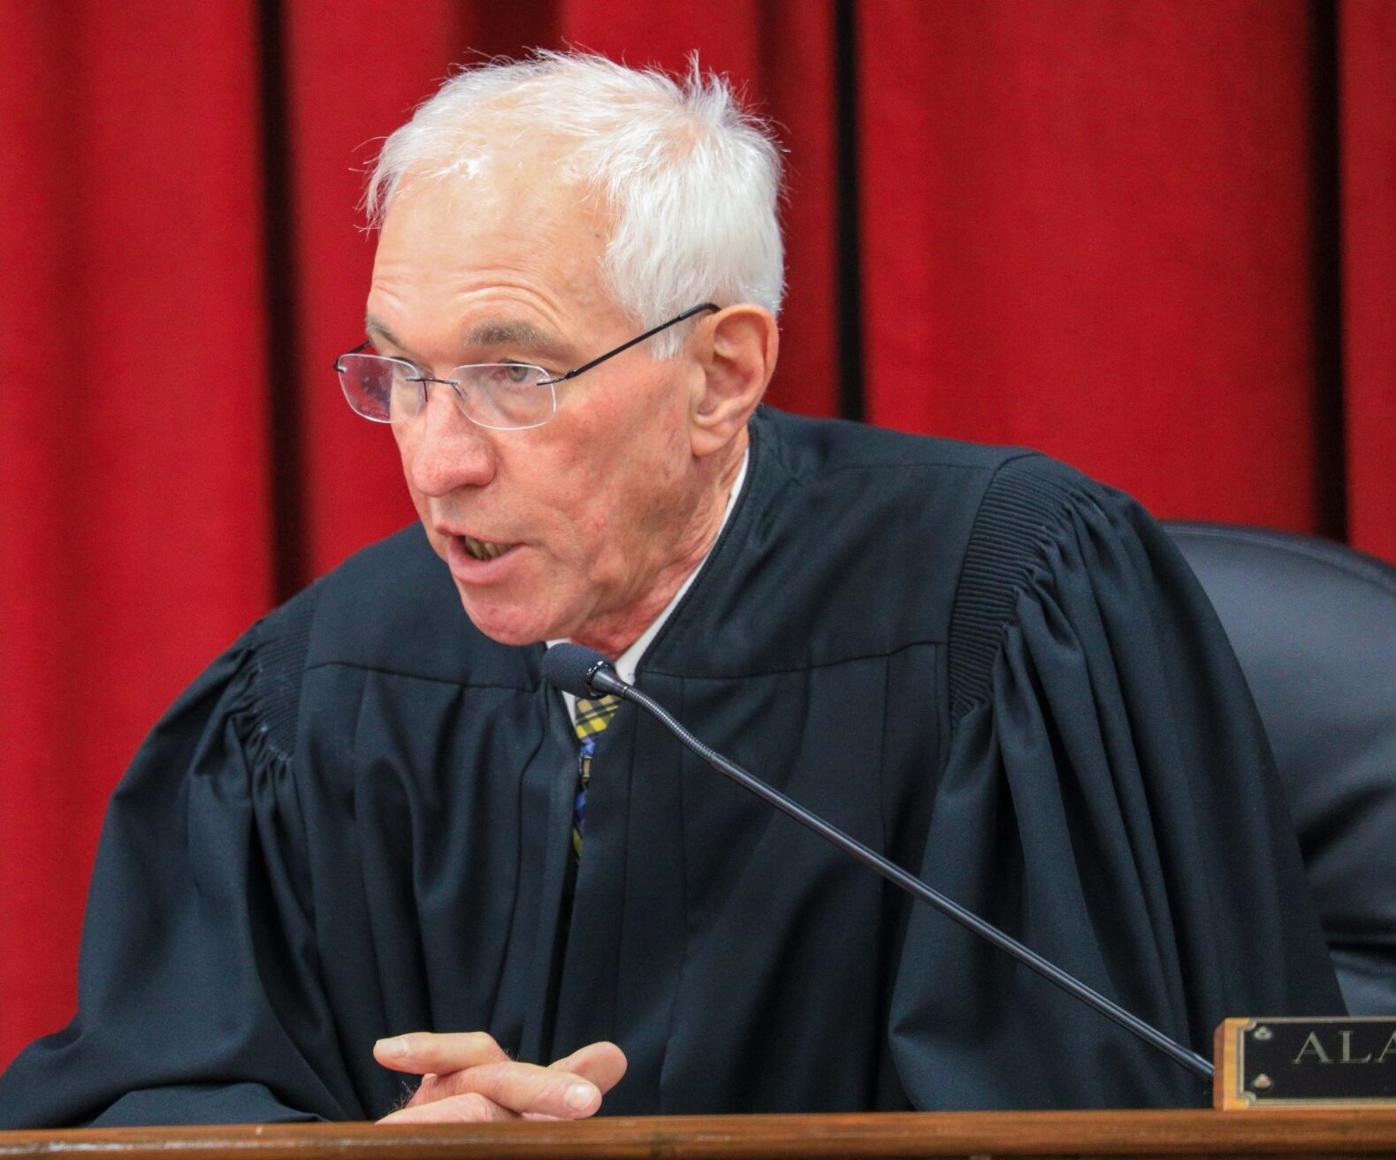 Judge Alan D. Moats